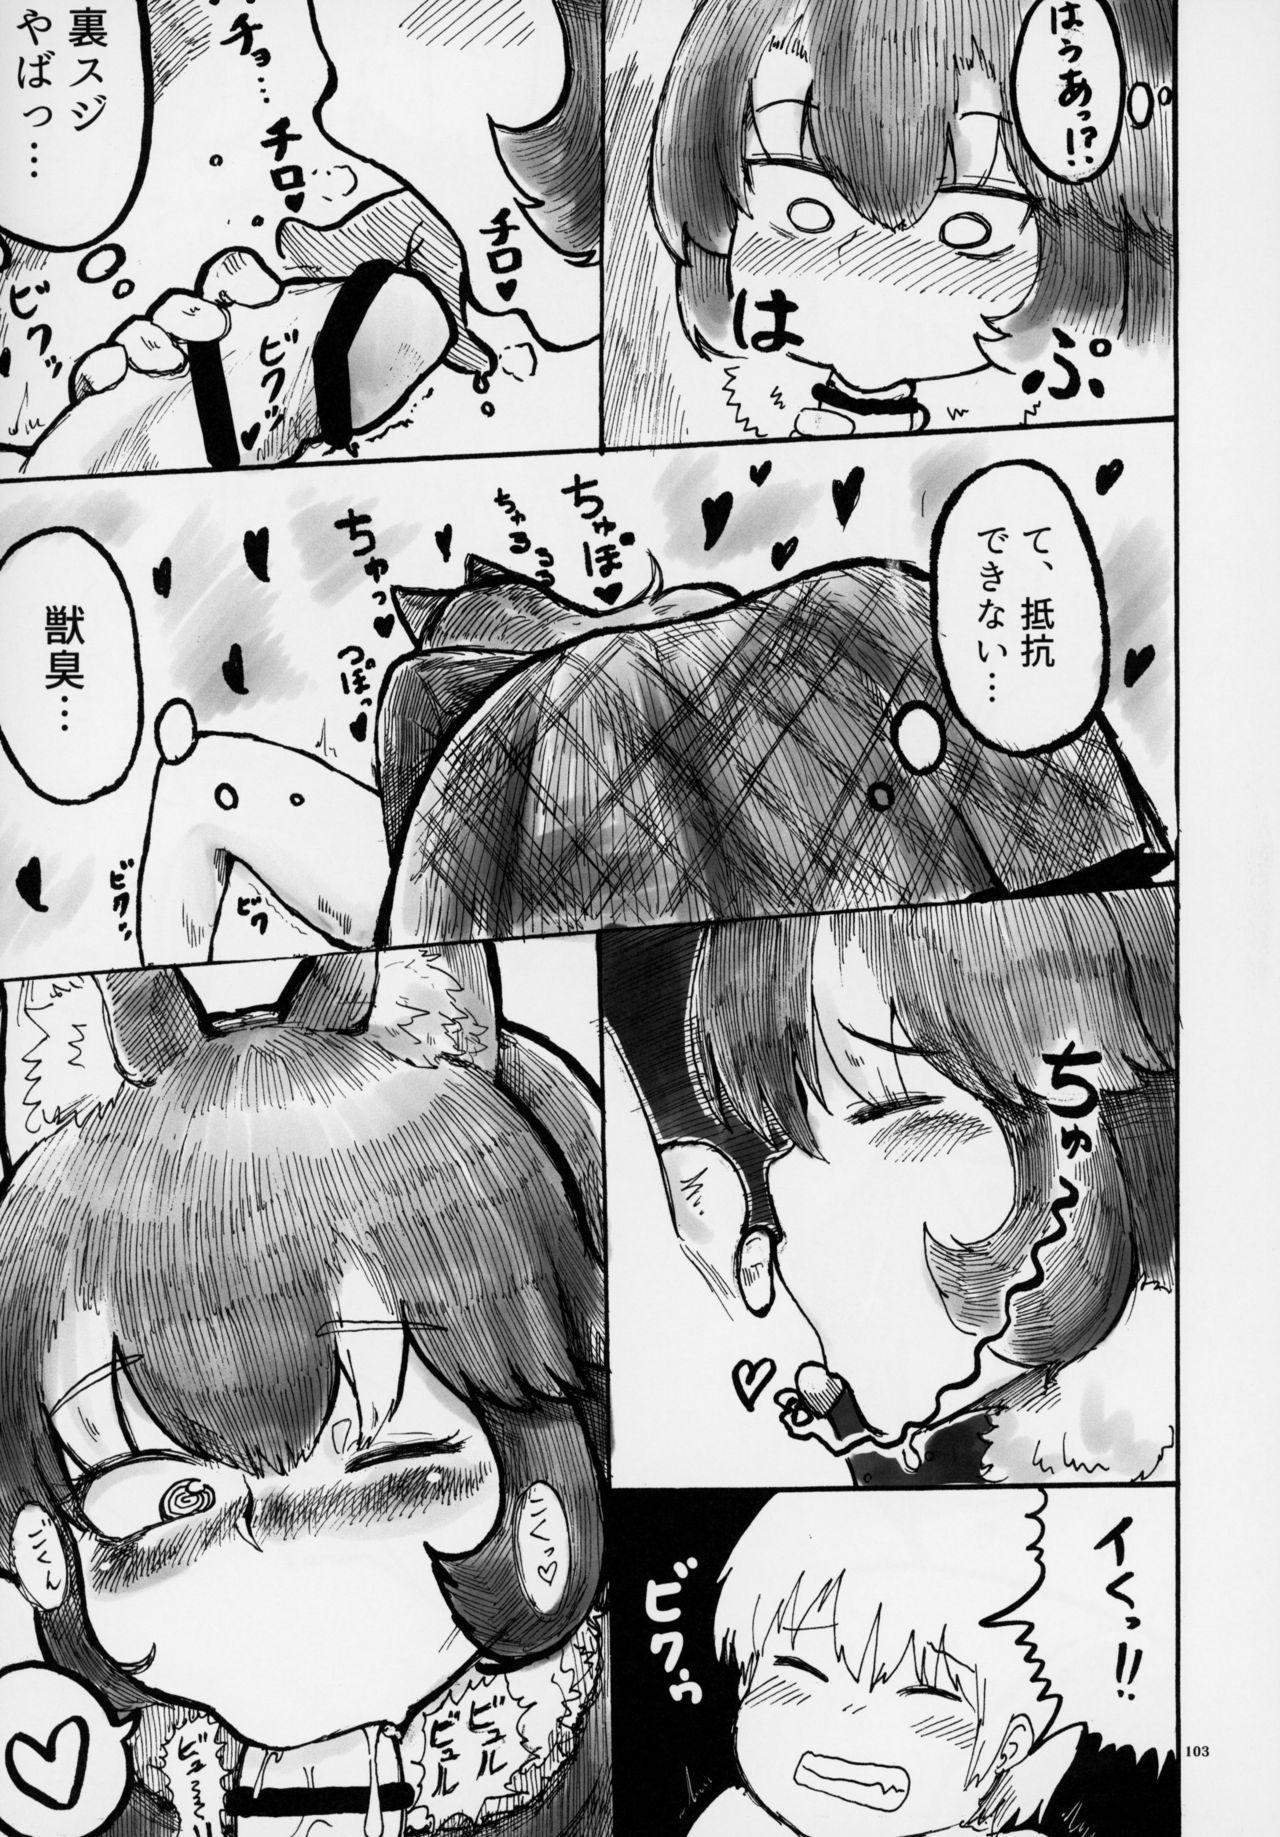 Friends Gyaku Rape Goudoushi 101